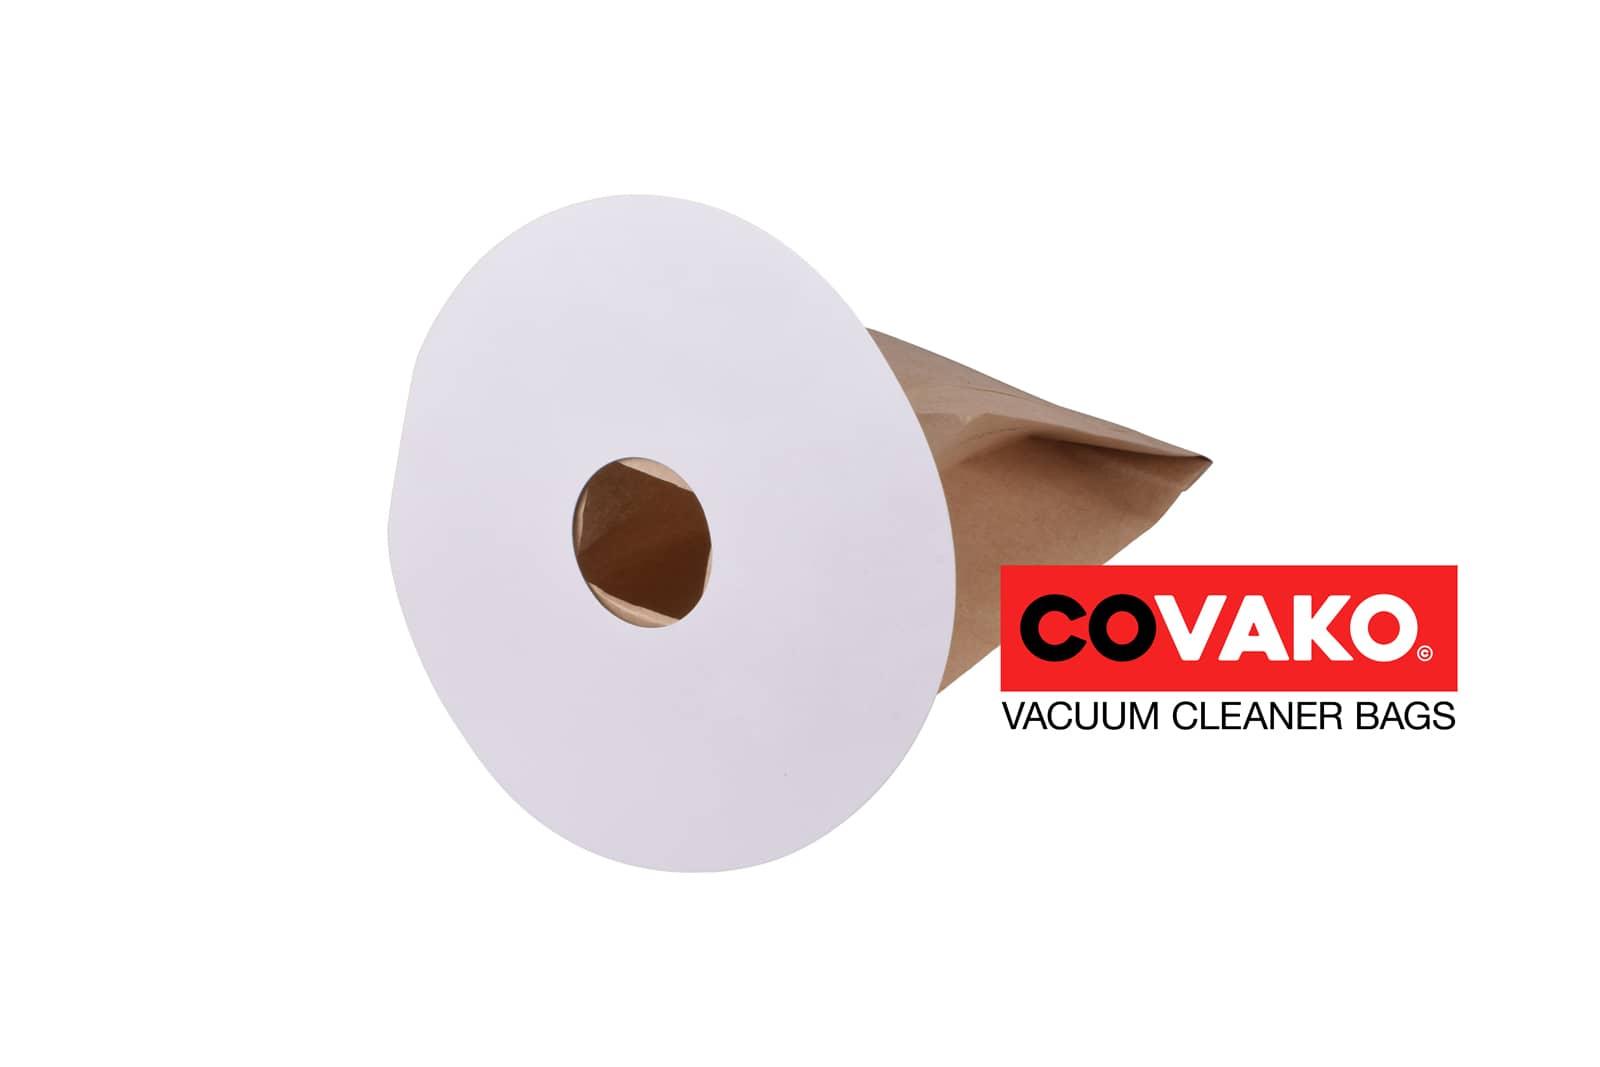 Fast Compacto Free Vac / Papier - Fast Staubsaugerbeutel